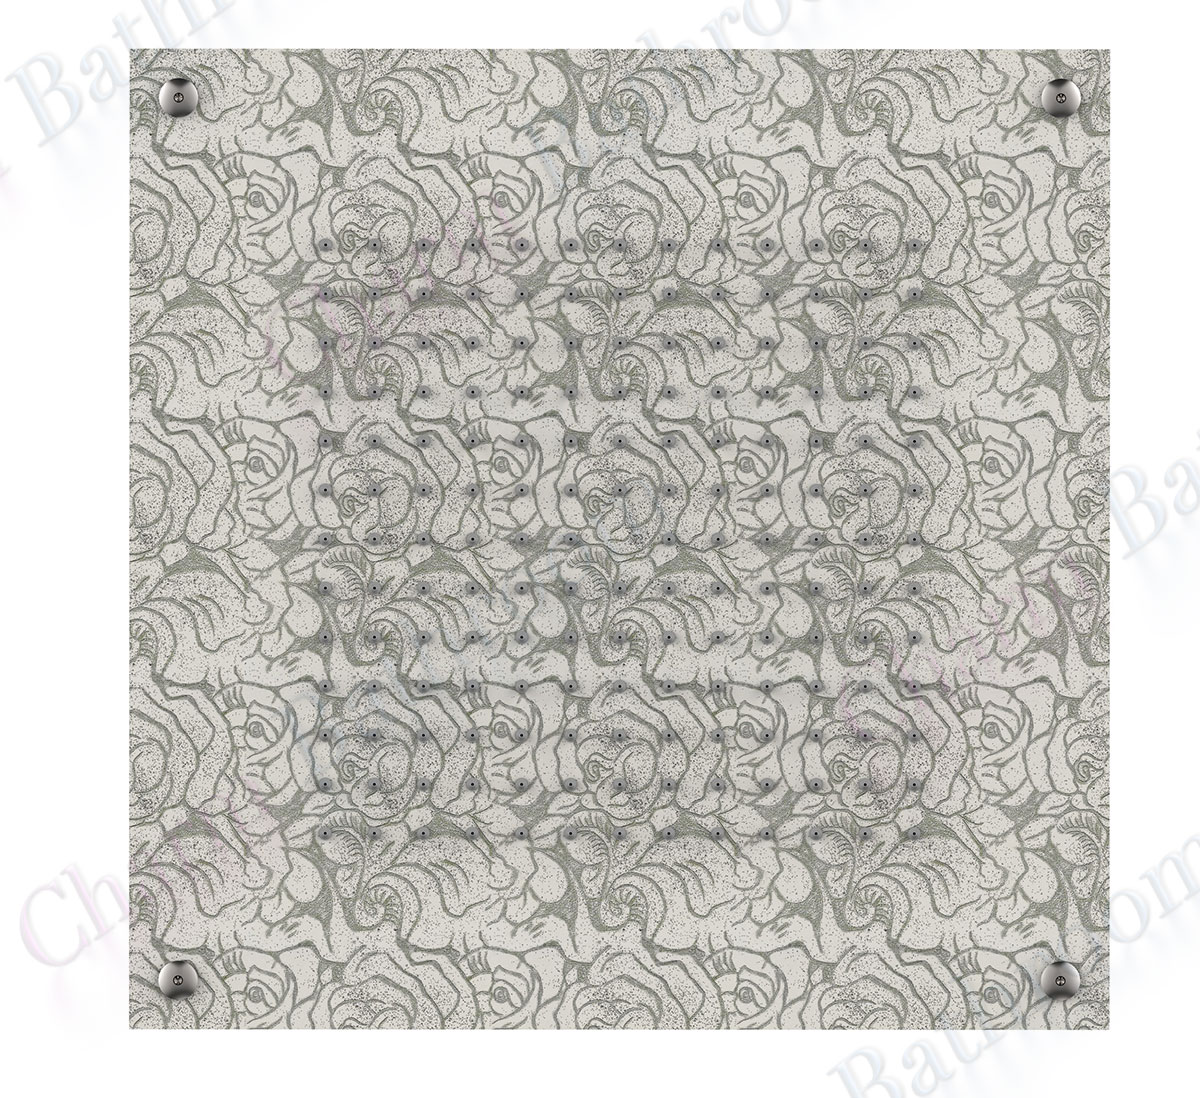 soffione-doccia-quadro-arabesque-ad-incasso-acciaio-inox-graffio.jpg